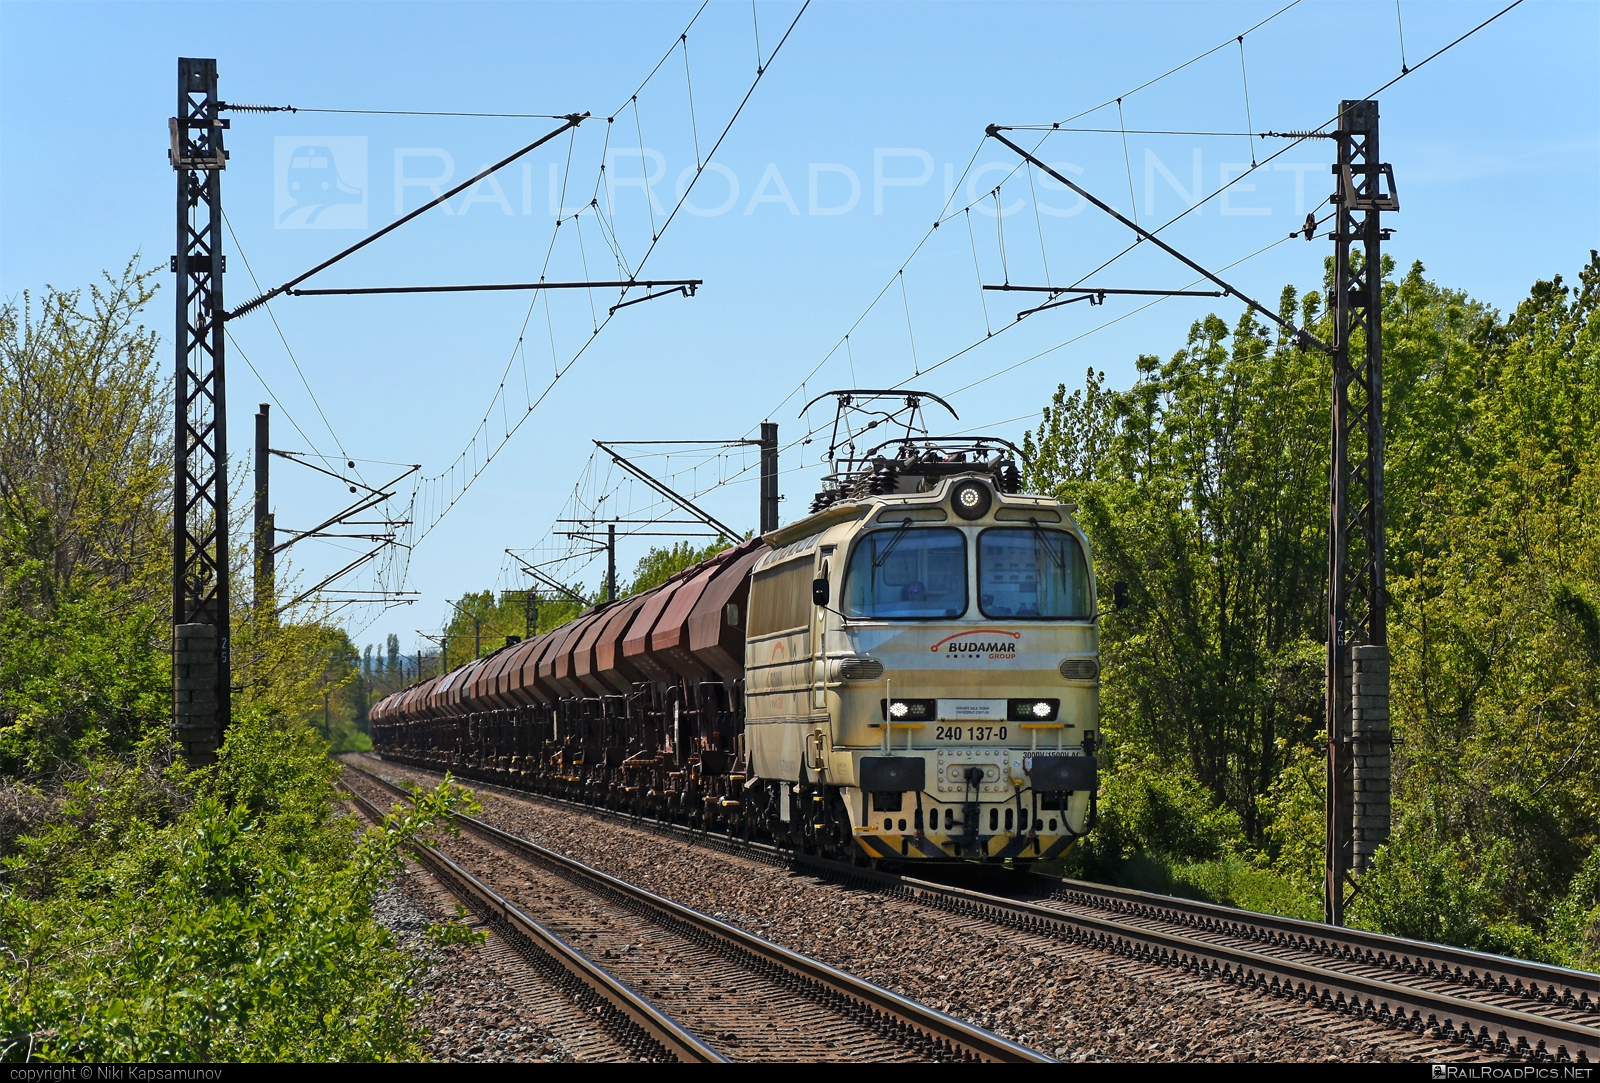 Škoda 47E - 240 137-0 operated by LOKORAIL, a.s. #BulkTransshipmentSlovakia #bts #budamar #hopperwagon #laminatka #locomotive240 #lokorail #lrl #skoda #skoda47e